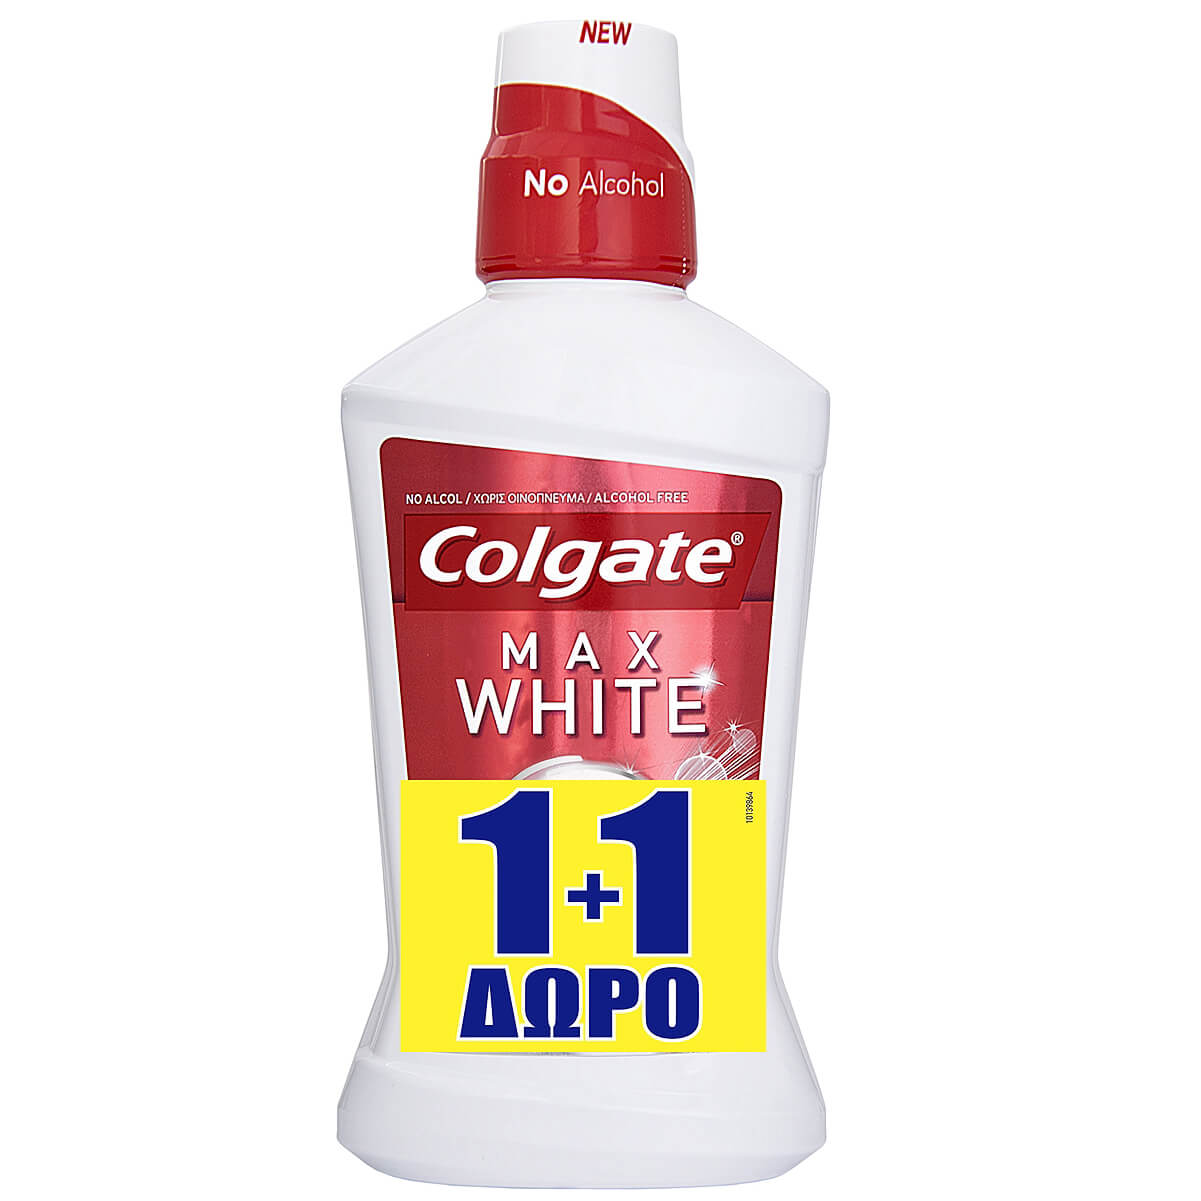 Colgate Πακέτο Προσφοράς Max White Instantly Στοματικό Διάλυμα για Λευκότερα Δόντια στη Στιγμή 2x500ml 1+1 Δώρο